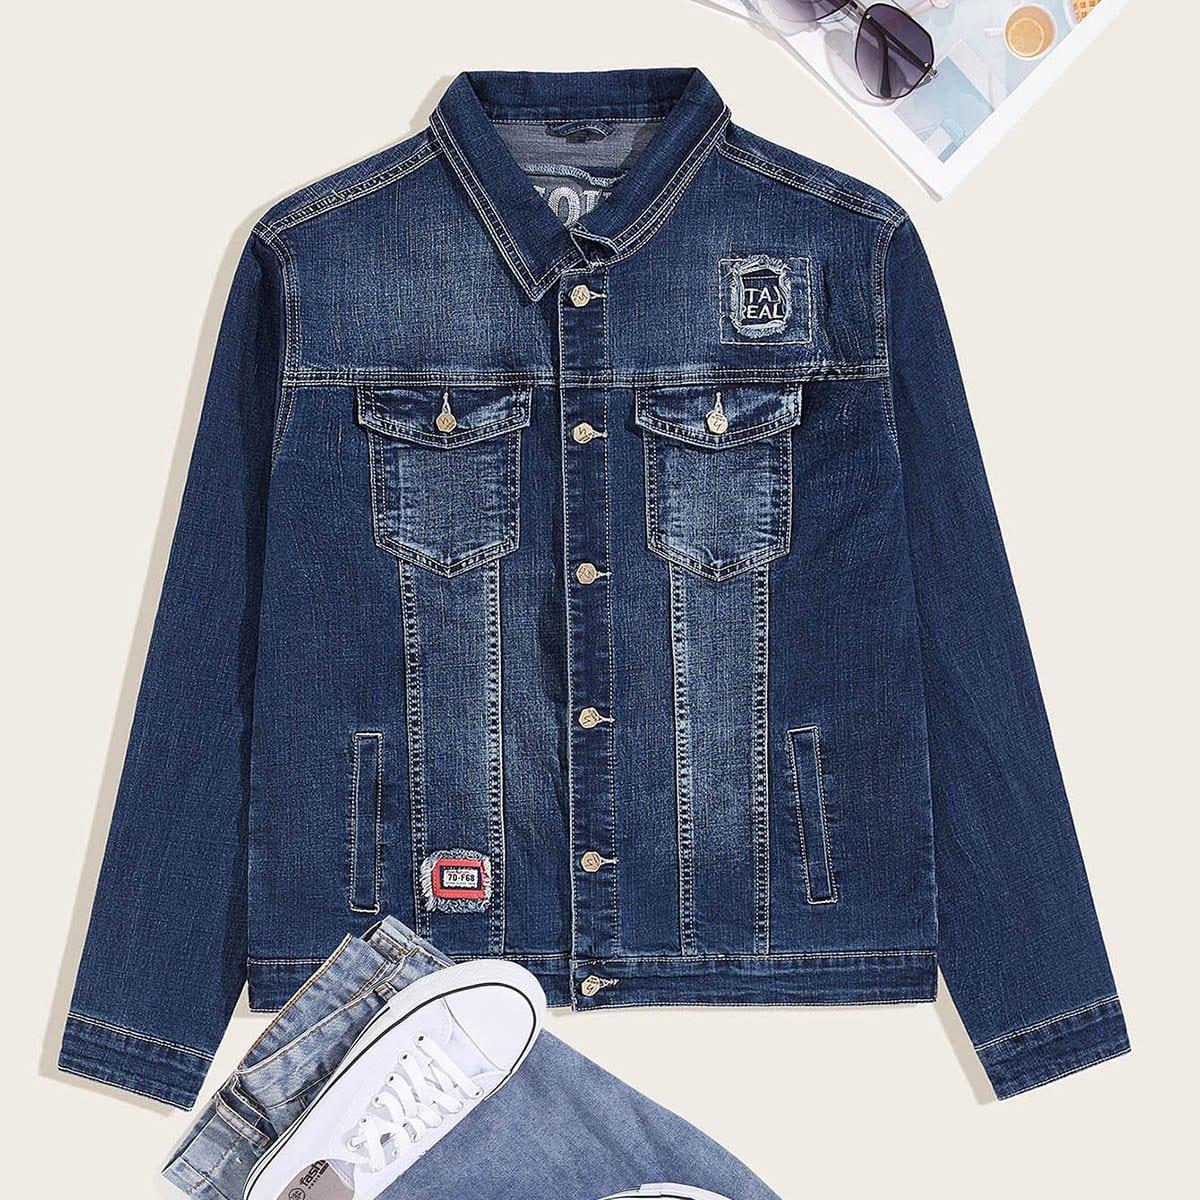 Marine Casual Tekst Heren Jeans jassen